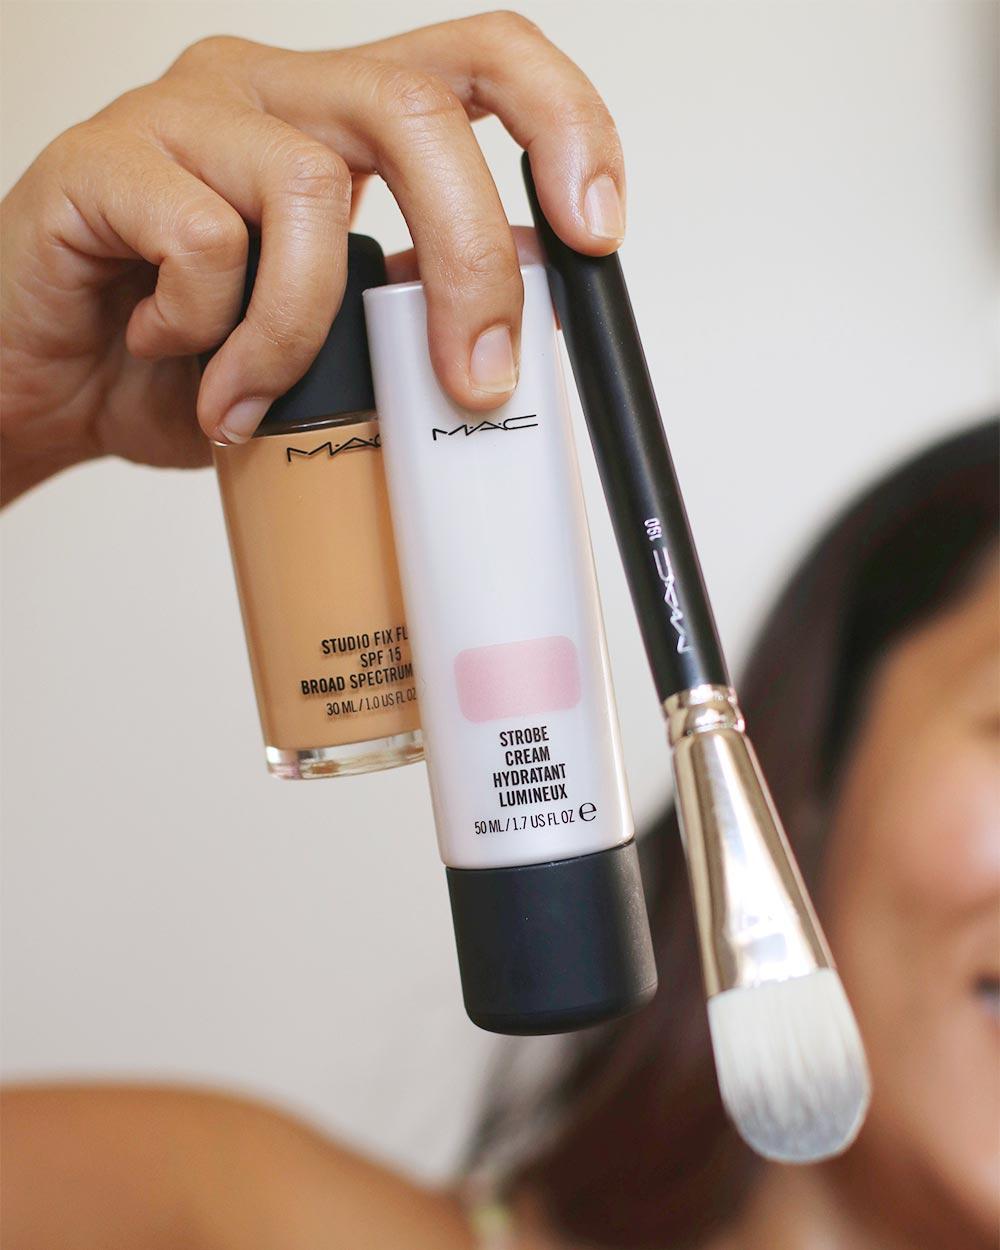 mac studio fix strobe cream pinklight brush